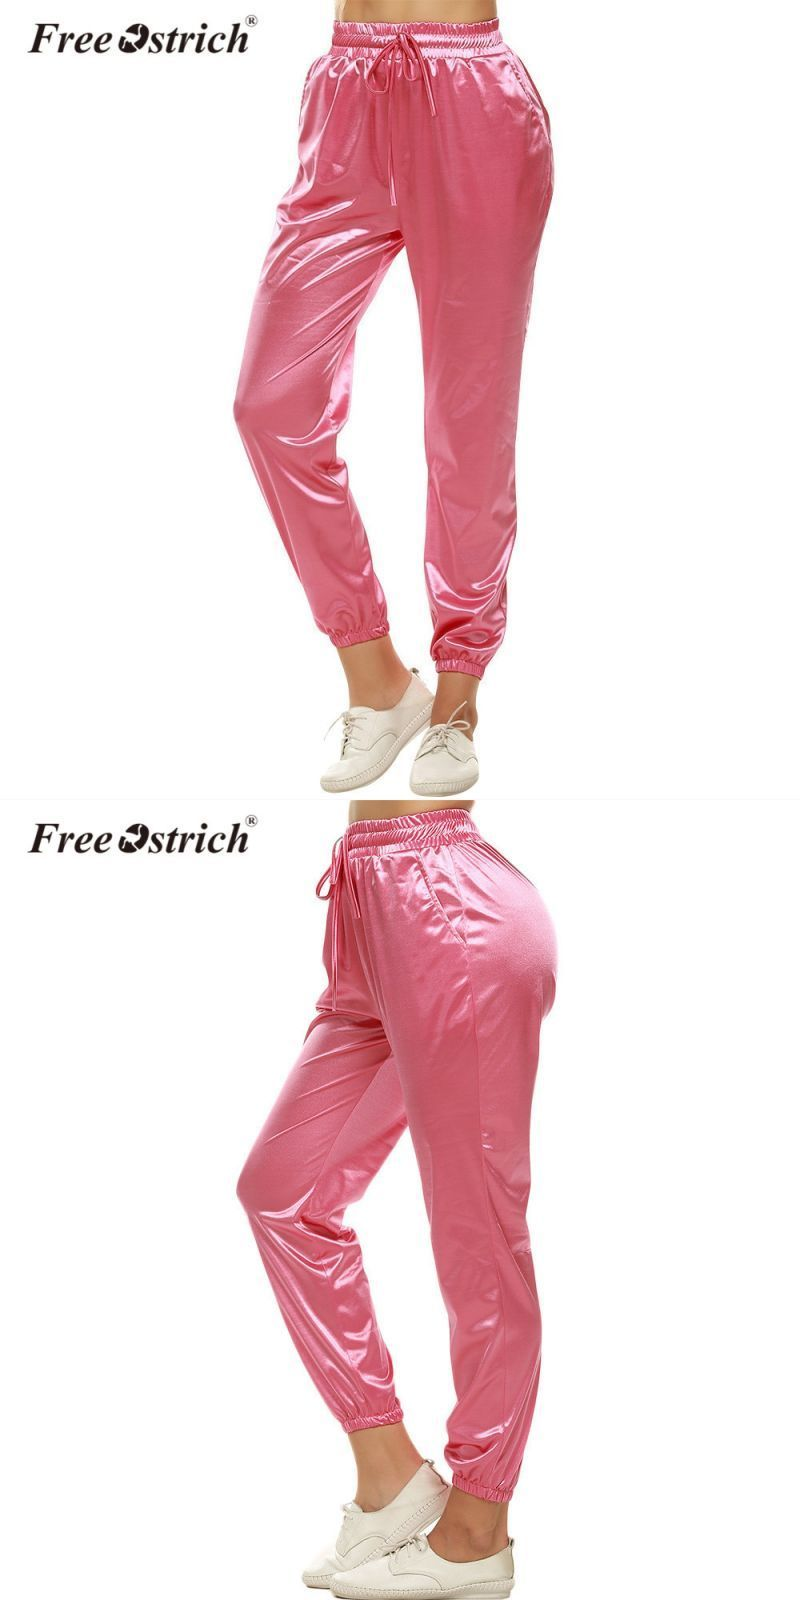 Sweatpants women 2018 pants joggers casual baggy high waist trousers  pantalon femme harajuku l2630  polyester 9b36f1e3b784